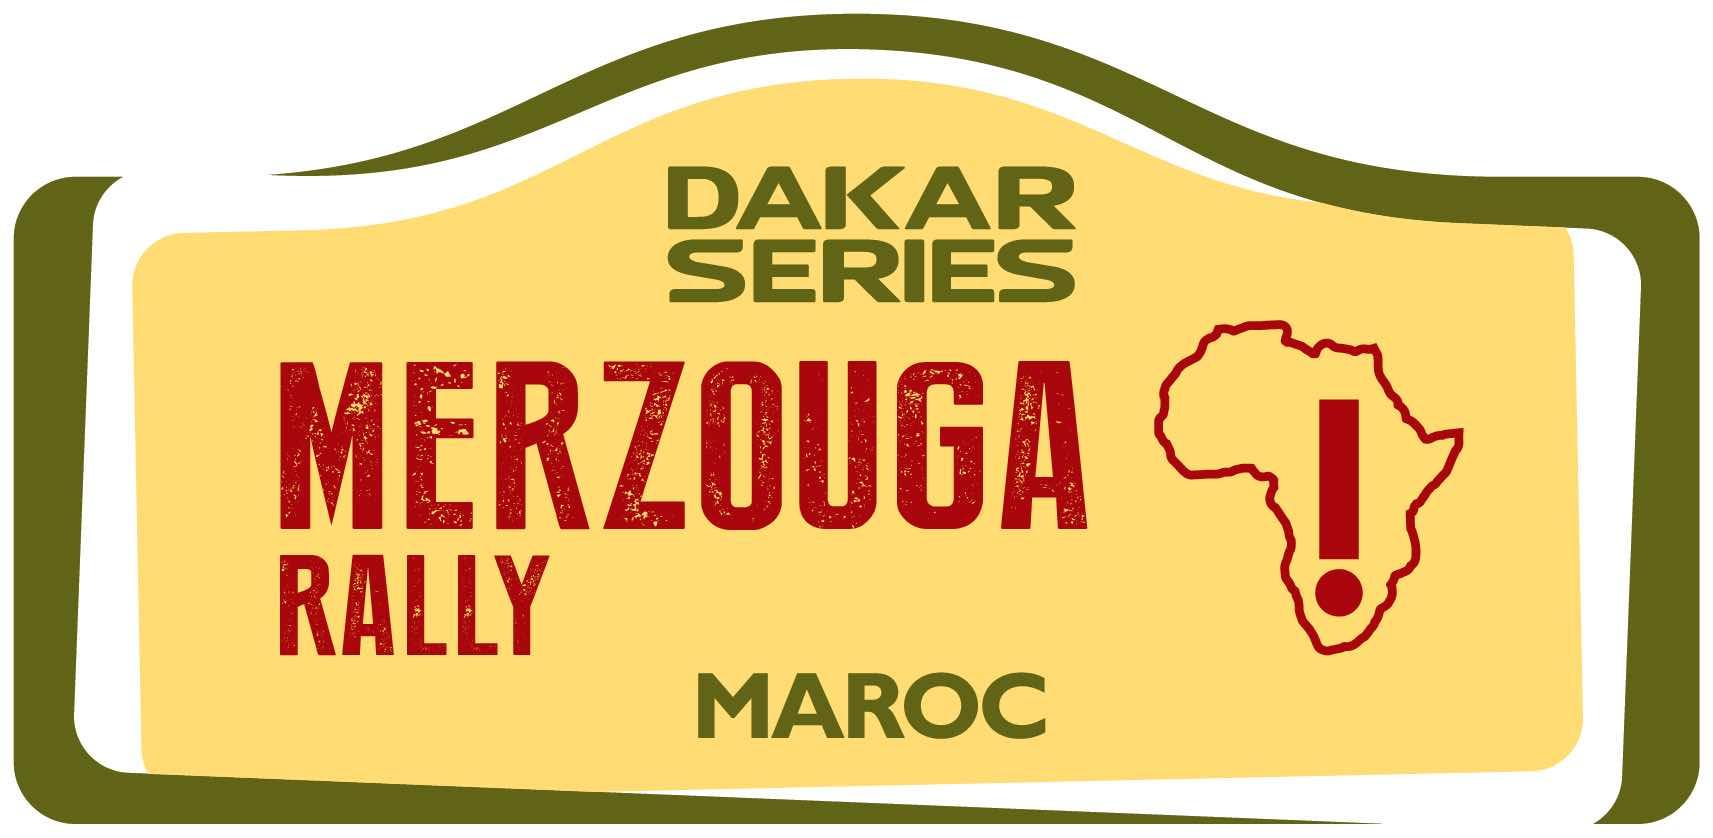 Colingua traduit le Rallye Merzouga au Maroc